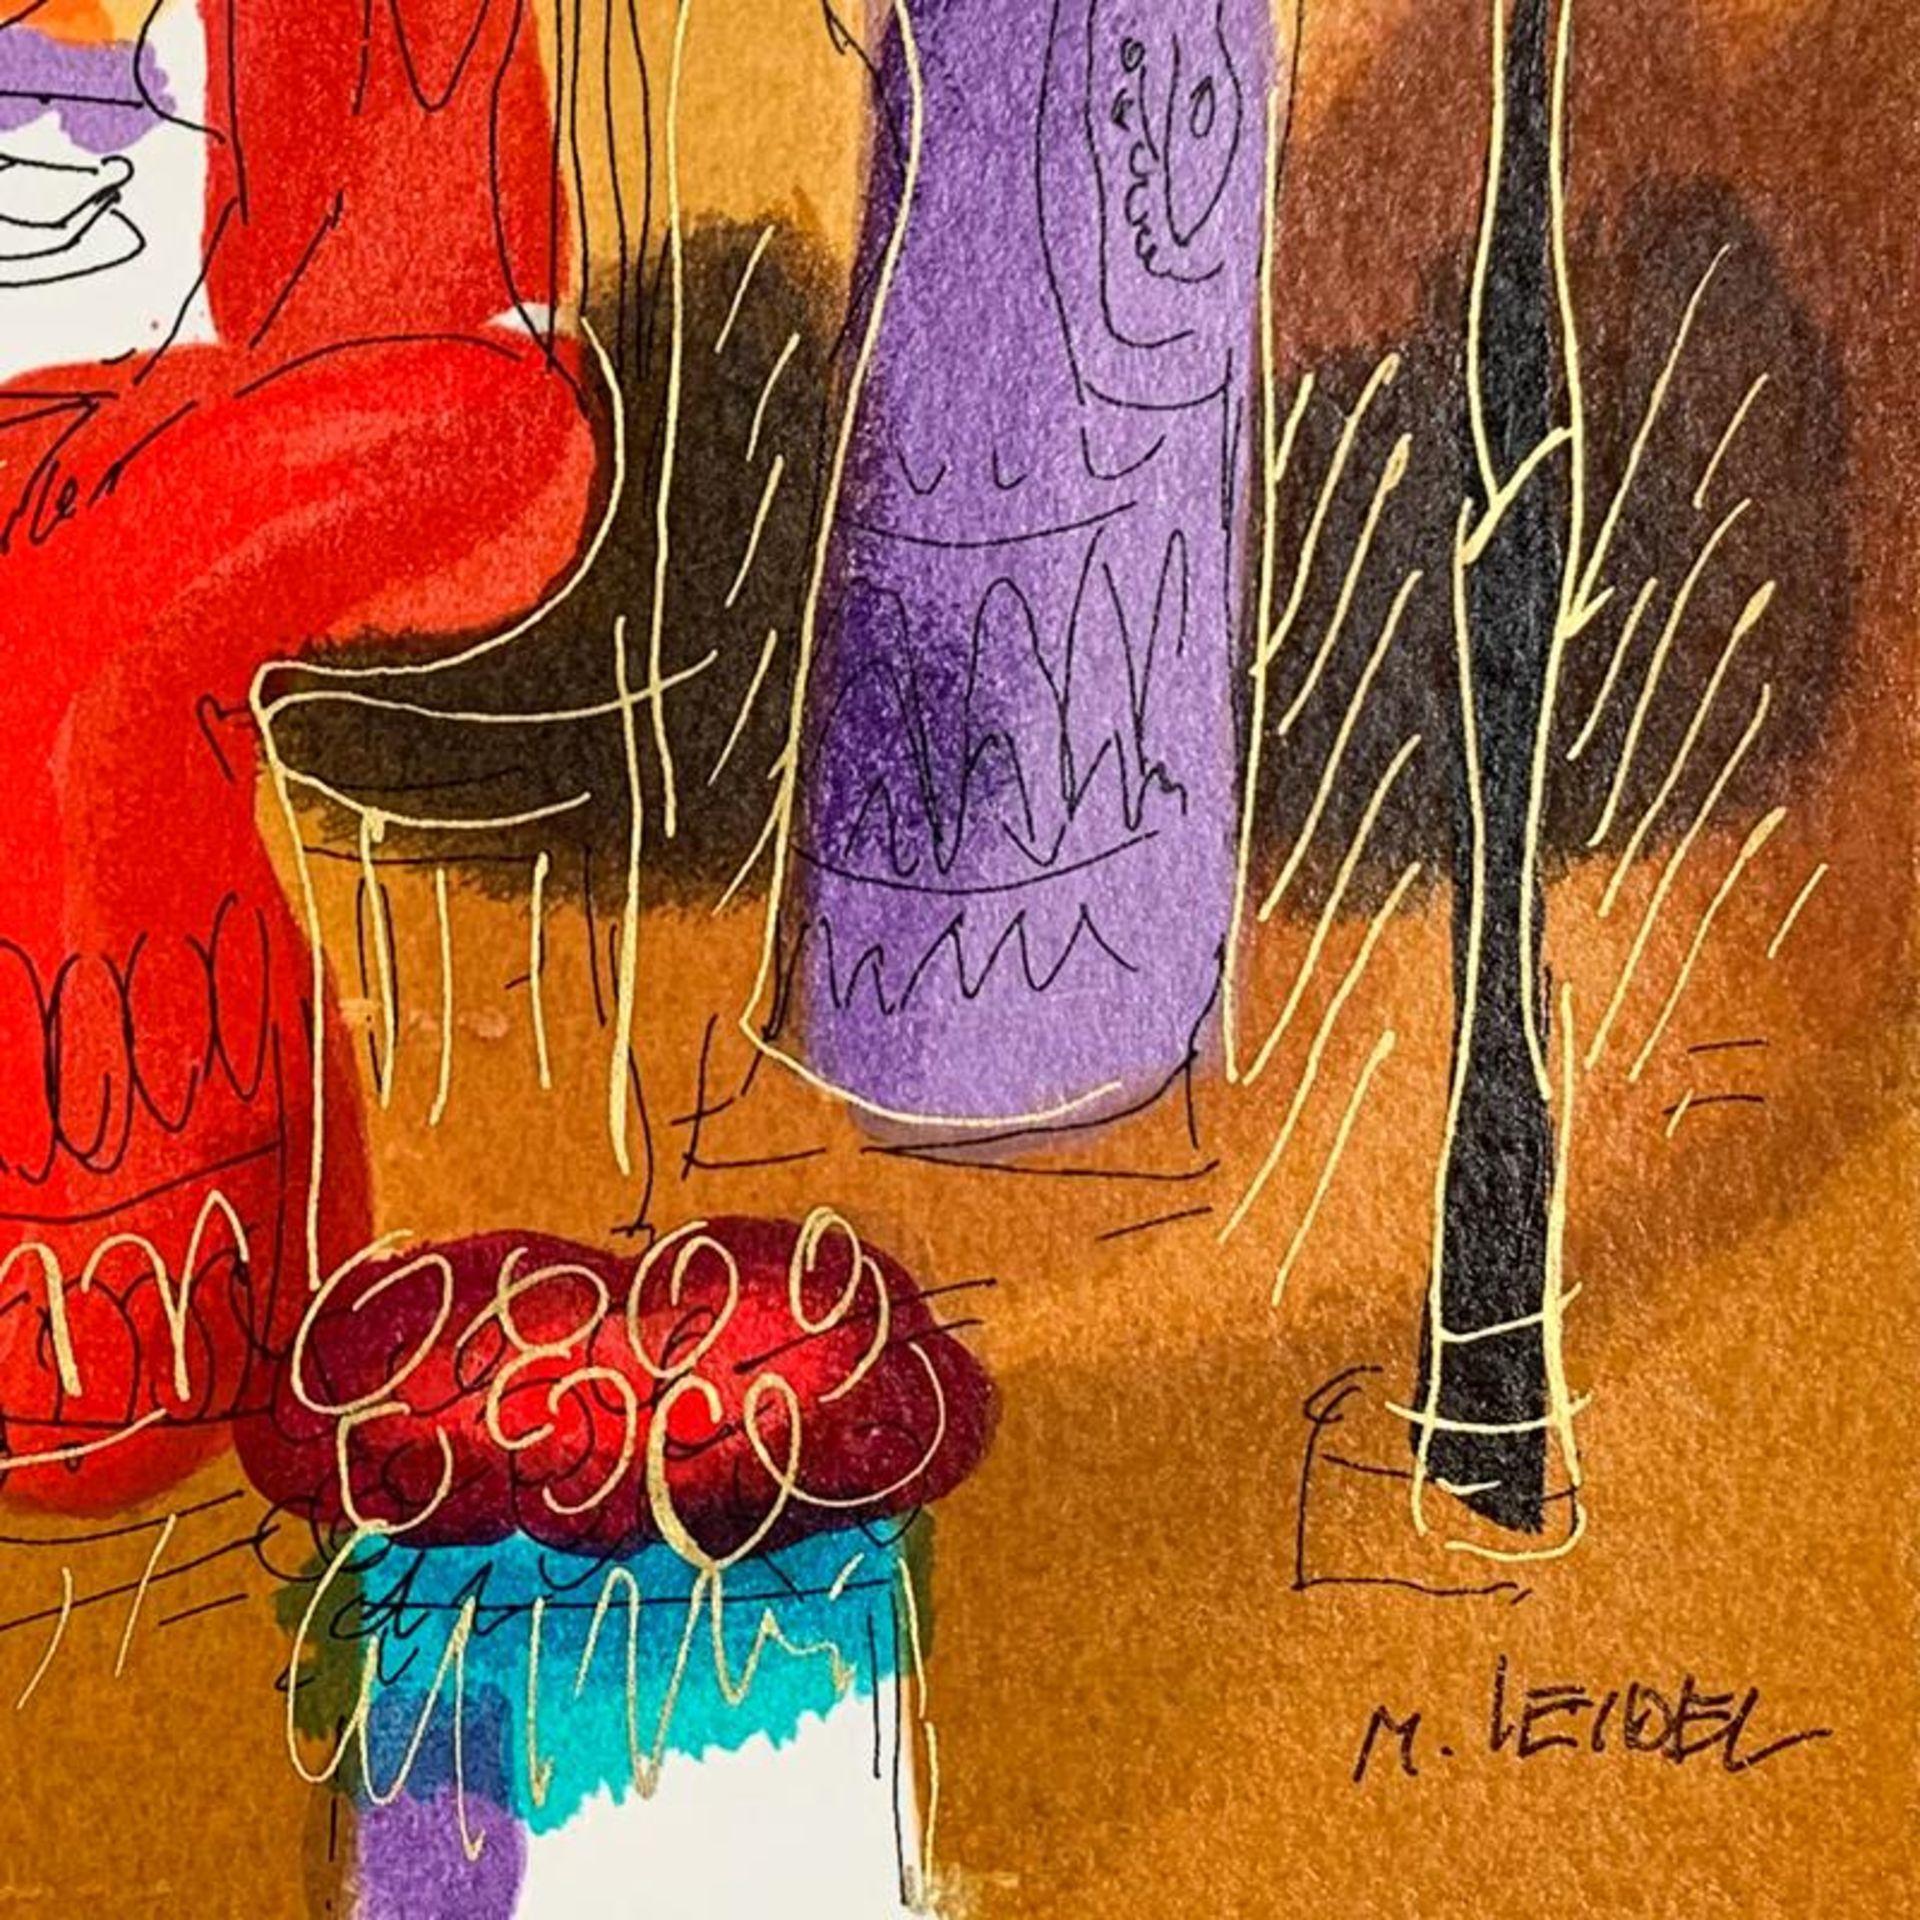 Untitled III by Leider, Moshe - Image 2 of 2